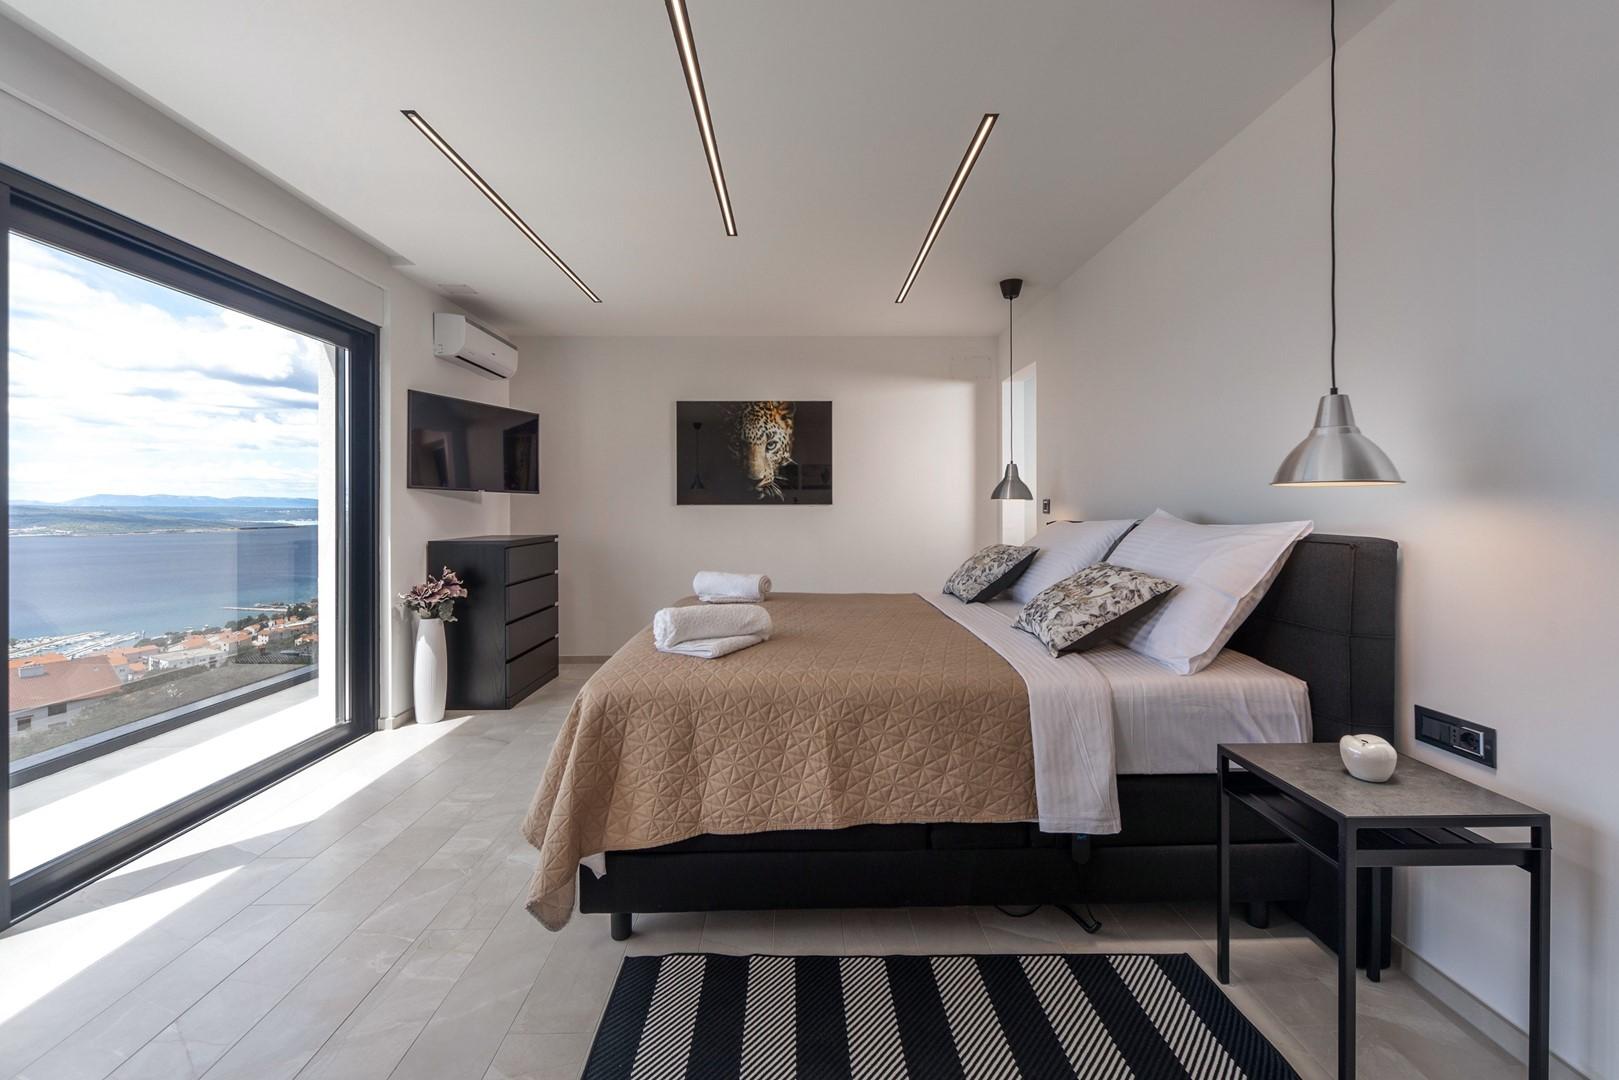 Maison de vacances Deluxe Villa Provvidenza with breathtaking Sea View (2819510), Crikvenica, , Kvarner, Croatie, image 11